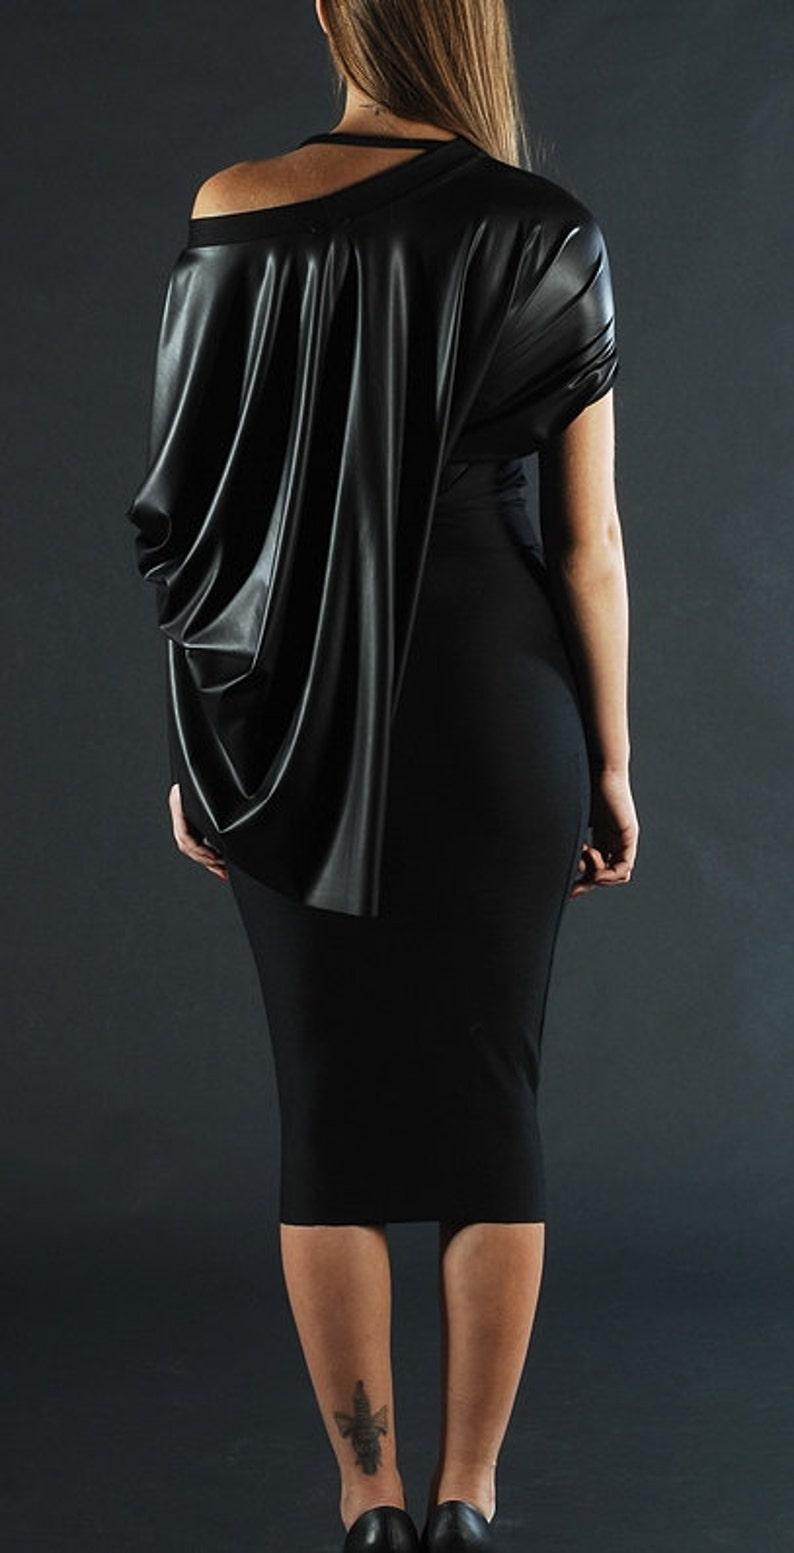 Eco Leather Dress Latex Dress Plus Size Dress Midi Dress | Etsy